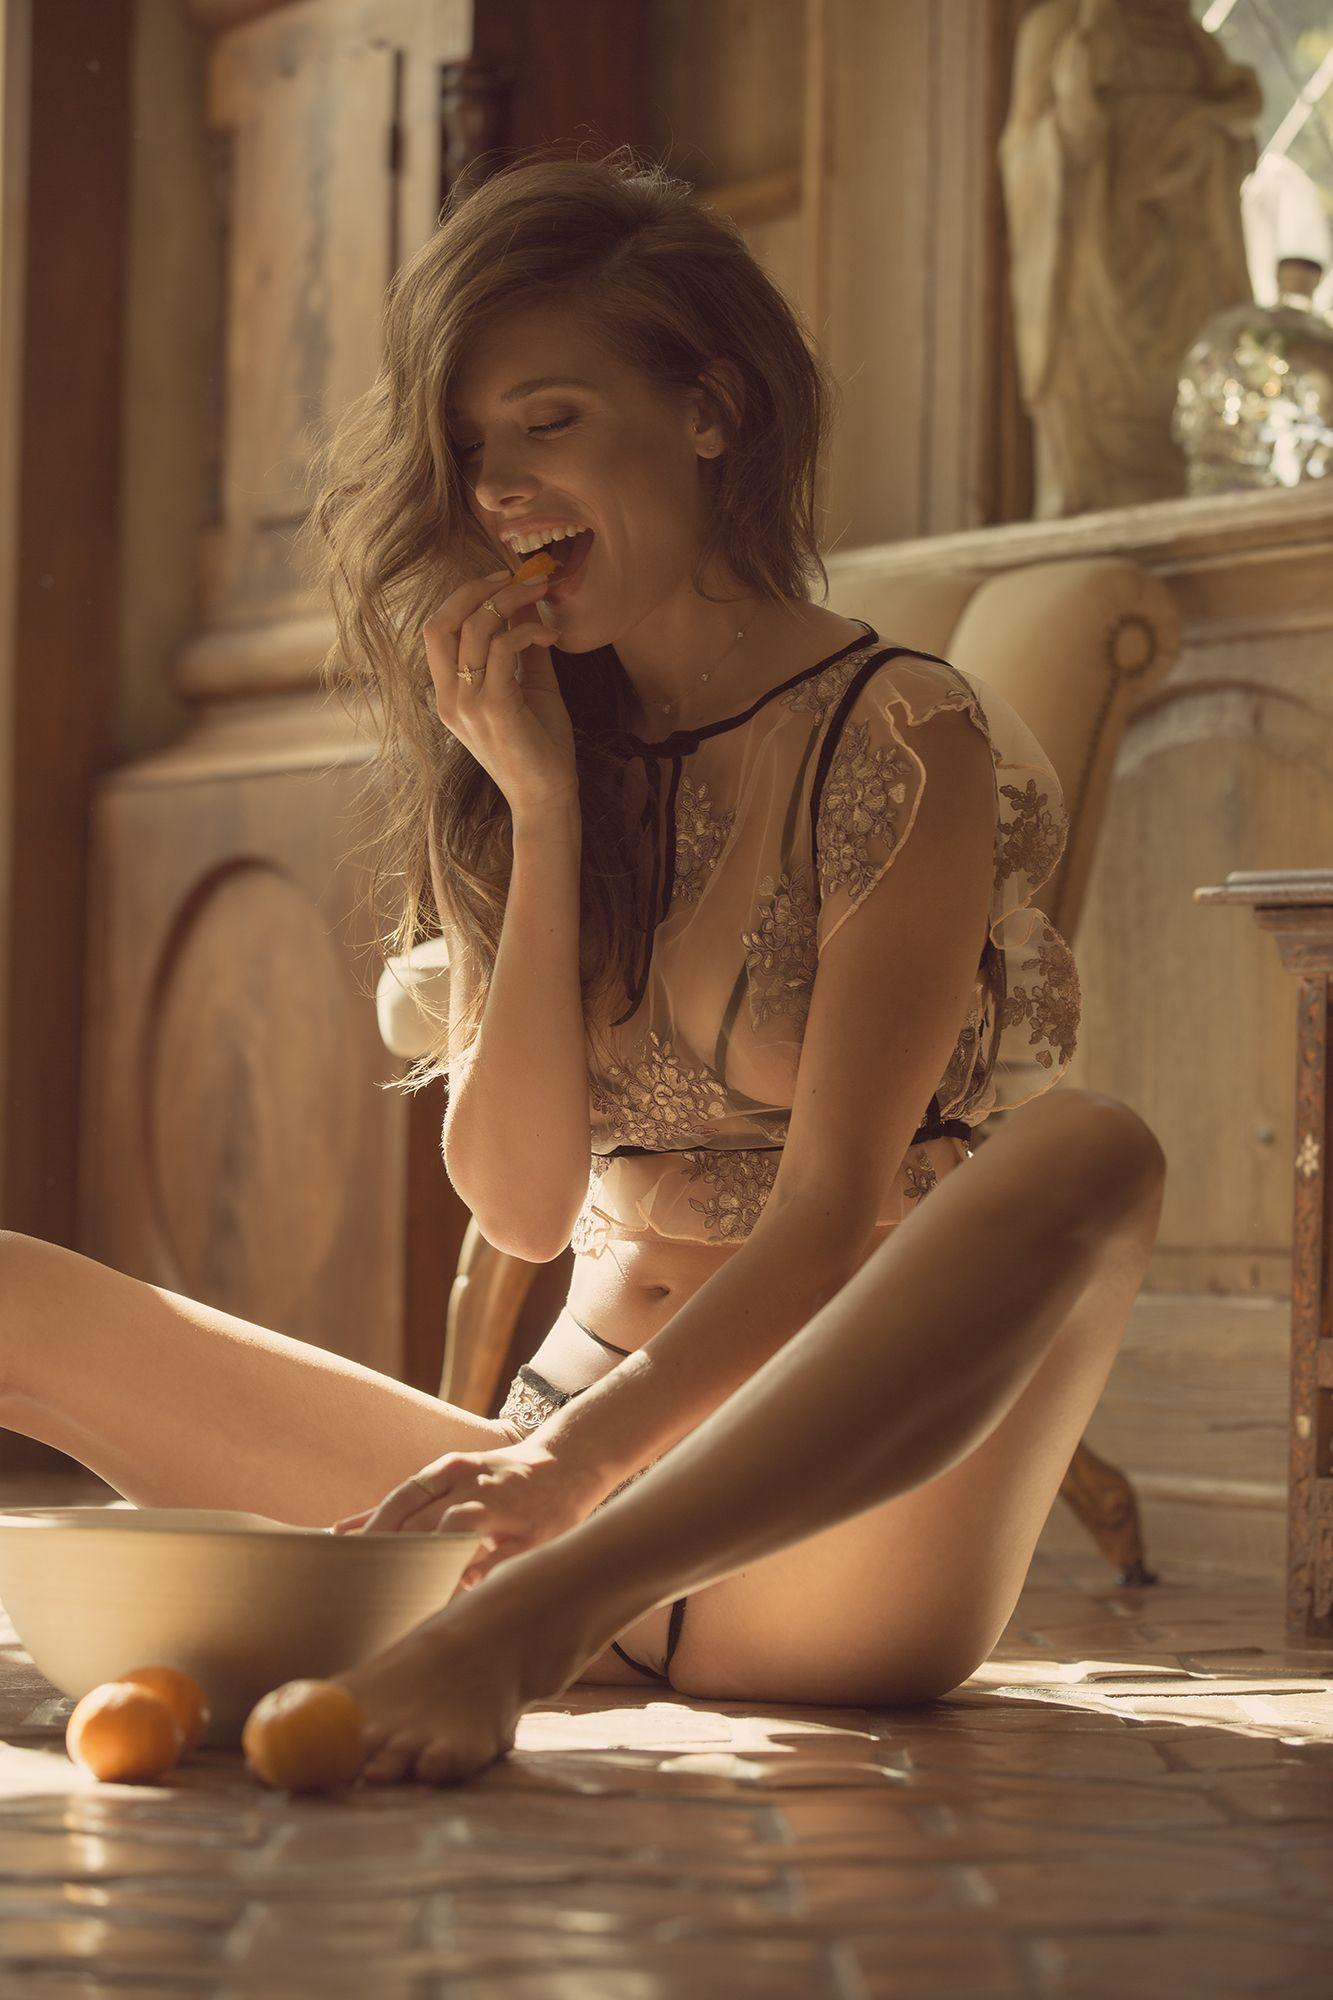 Kayla Jean Garvin Nude Photos Shoot for Playboy